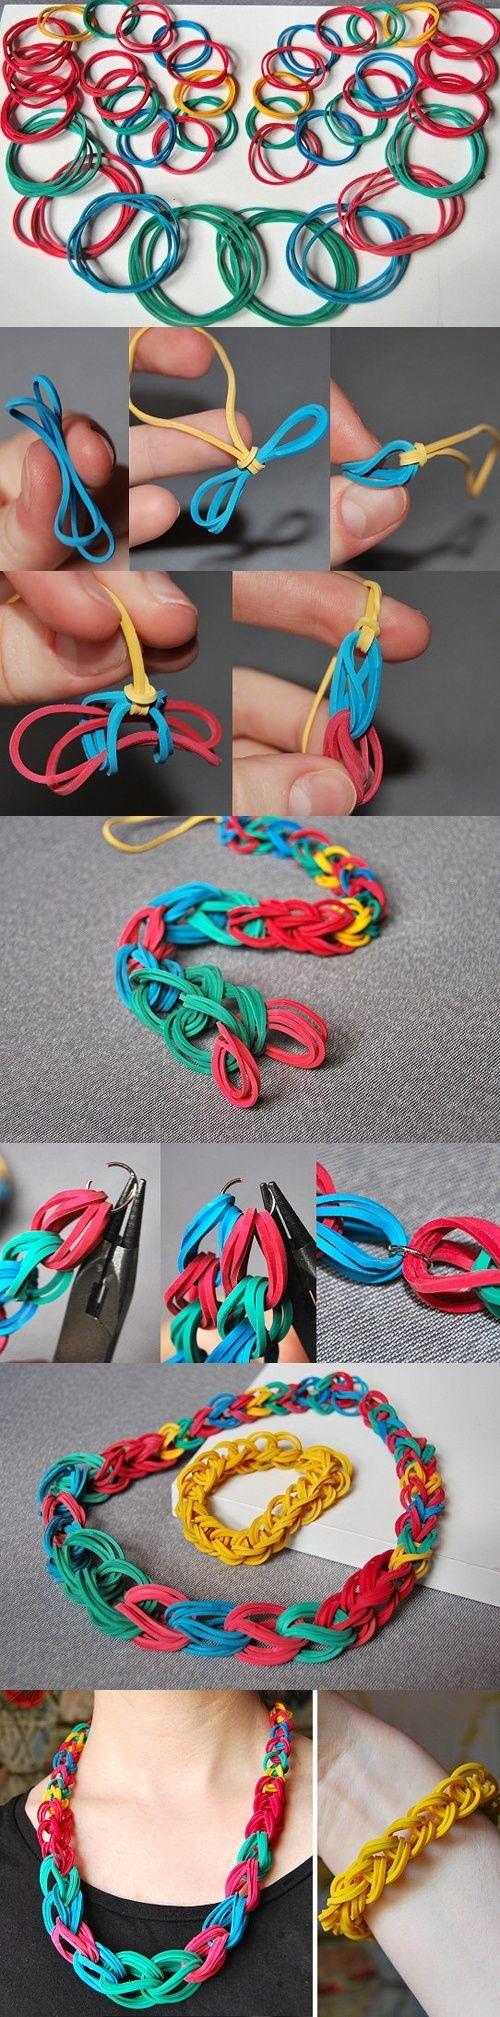 DIY Simple Rubber Band Bracelet DIY Projects | UsefulDIY.com